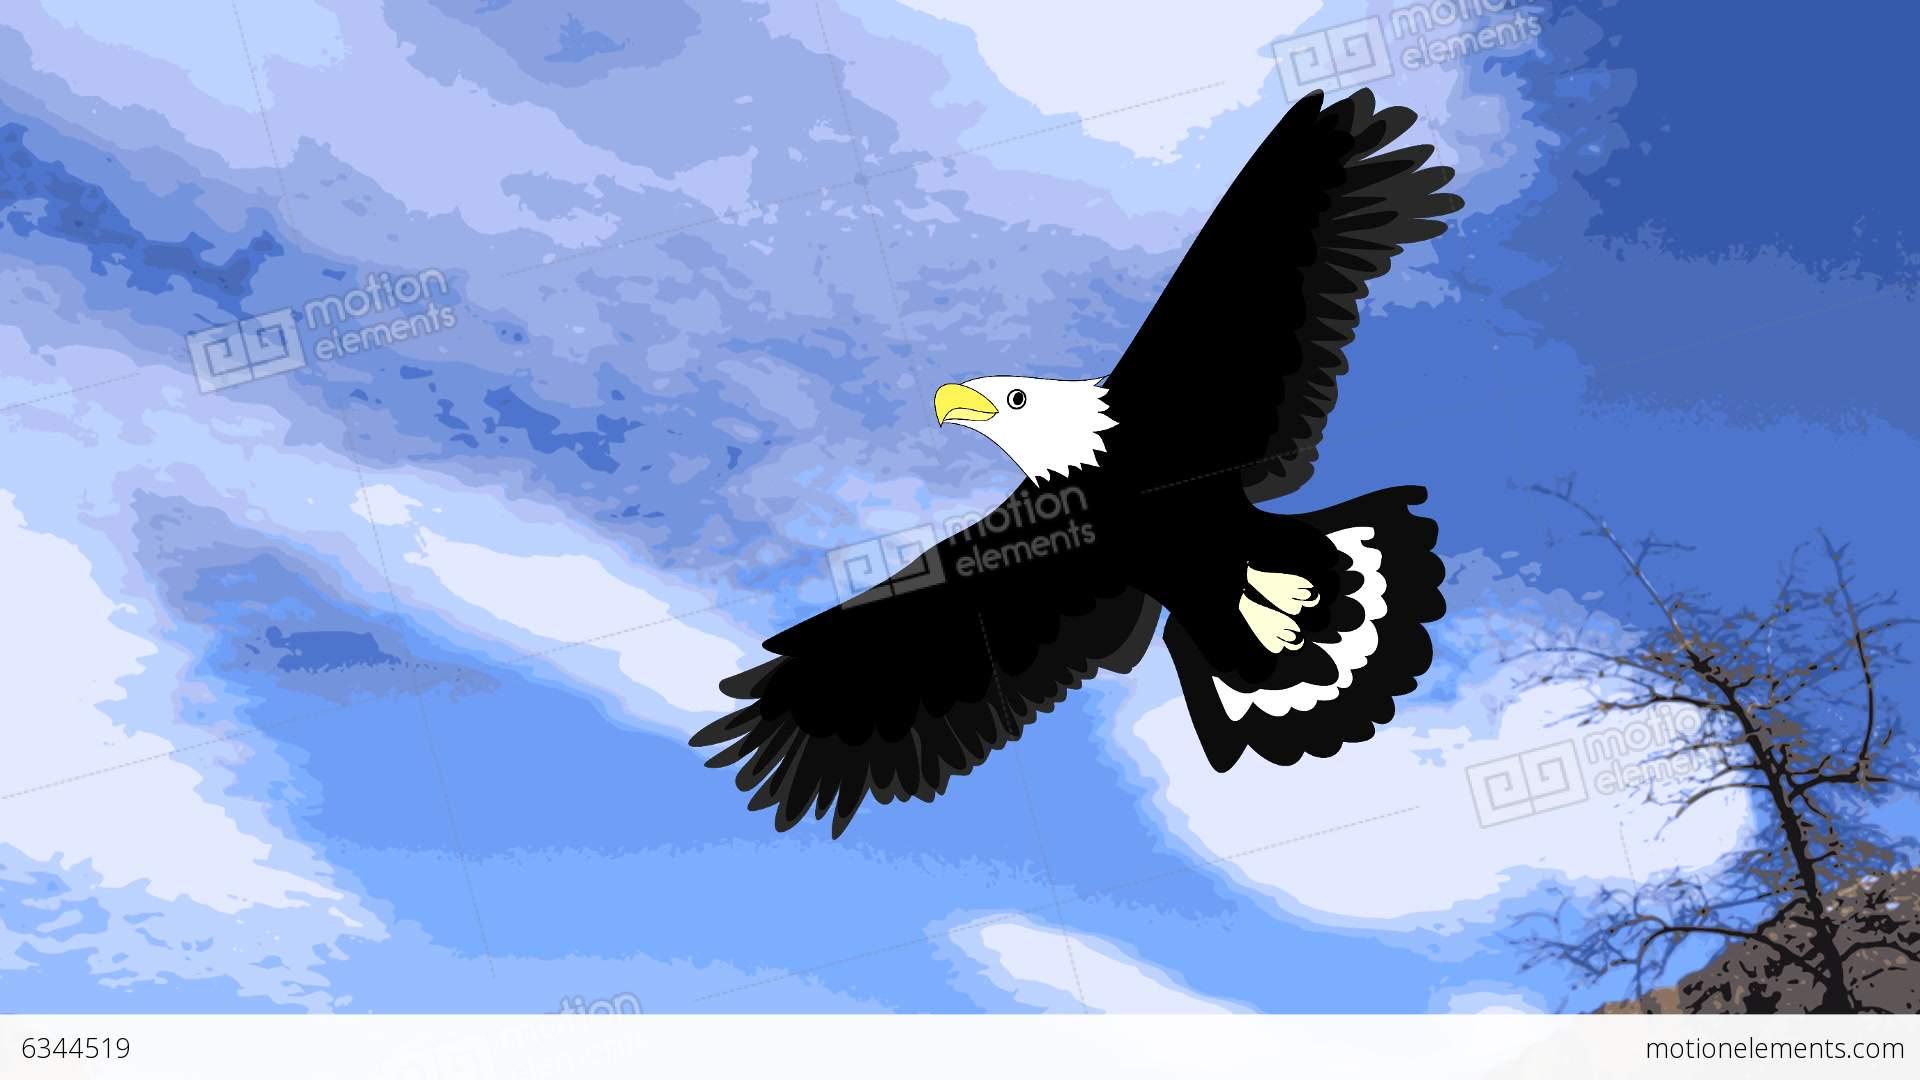 Lovely Eagle Soars In The Sky, Animation, Cartoon Stock